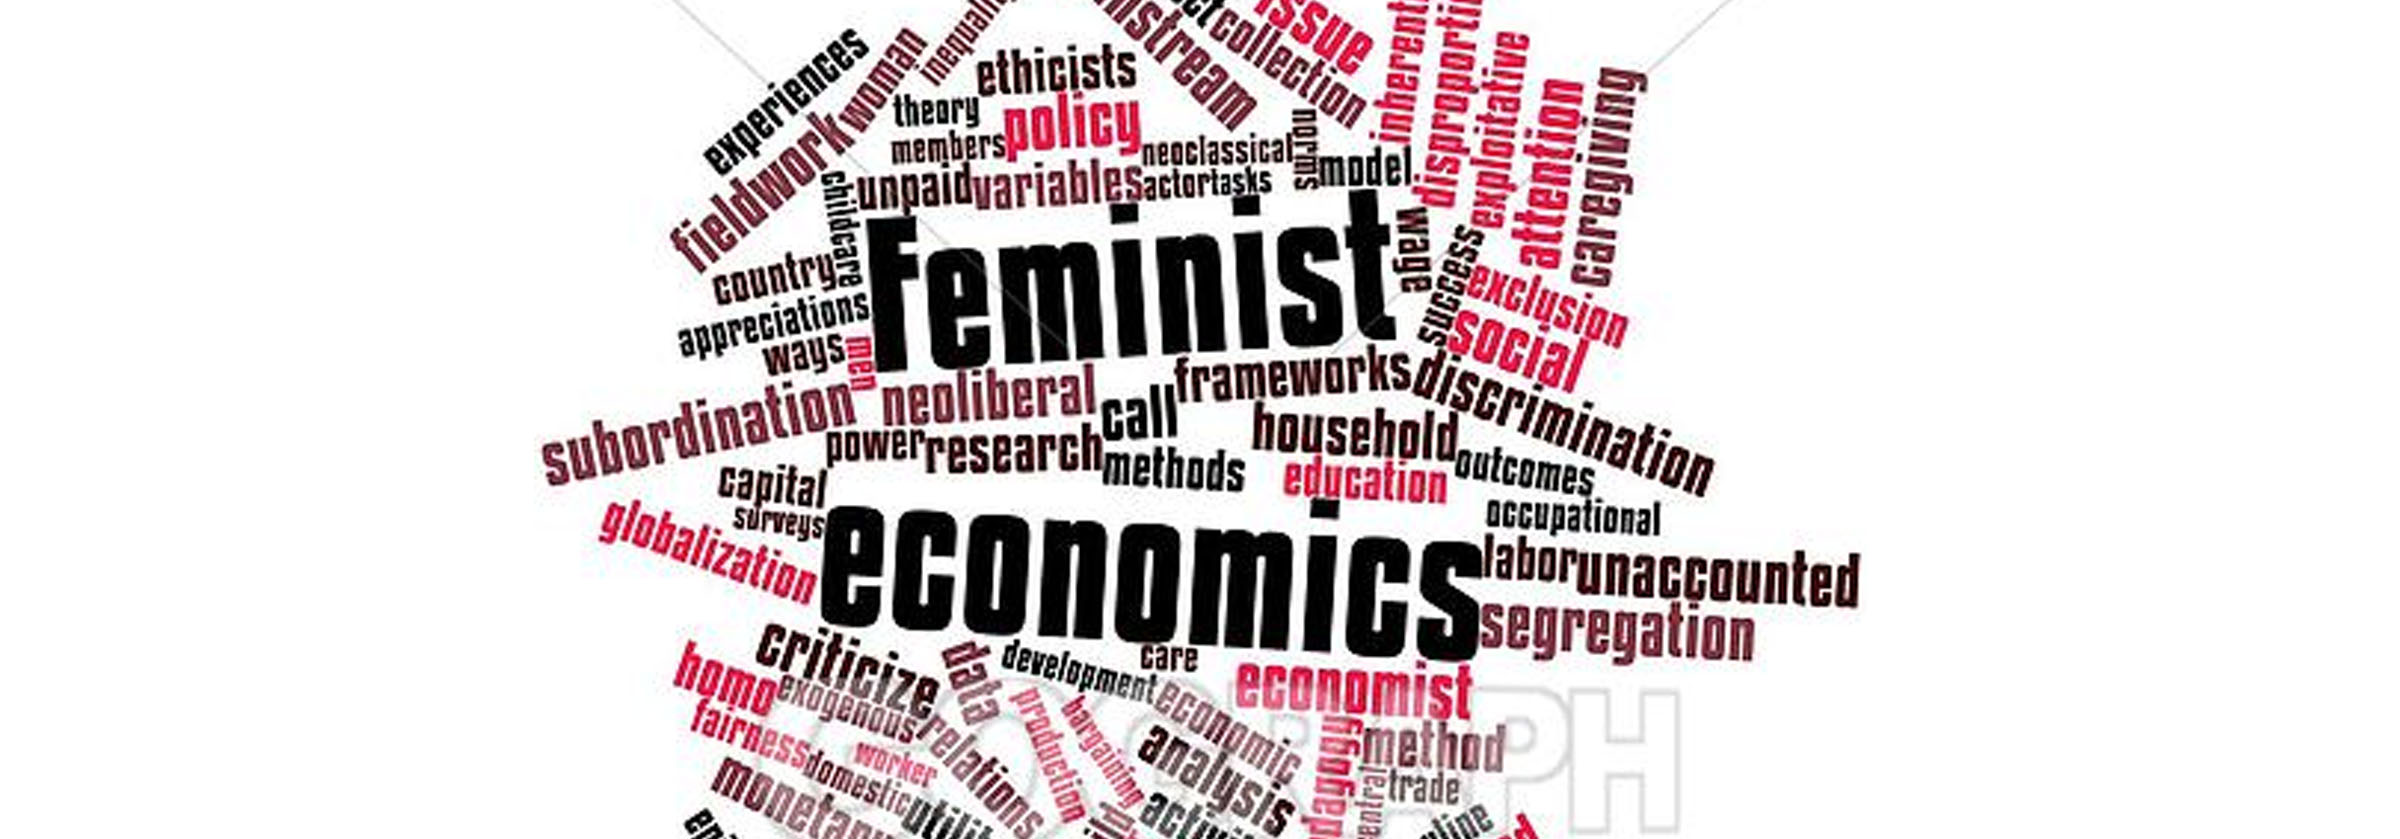 Feminis Ekonomi: Gugatan atas Narasi Besar Ekonomi yang Maskulin